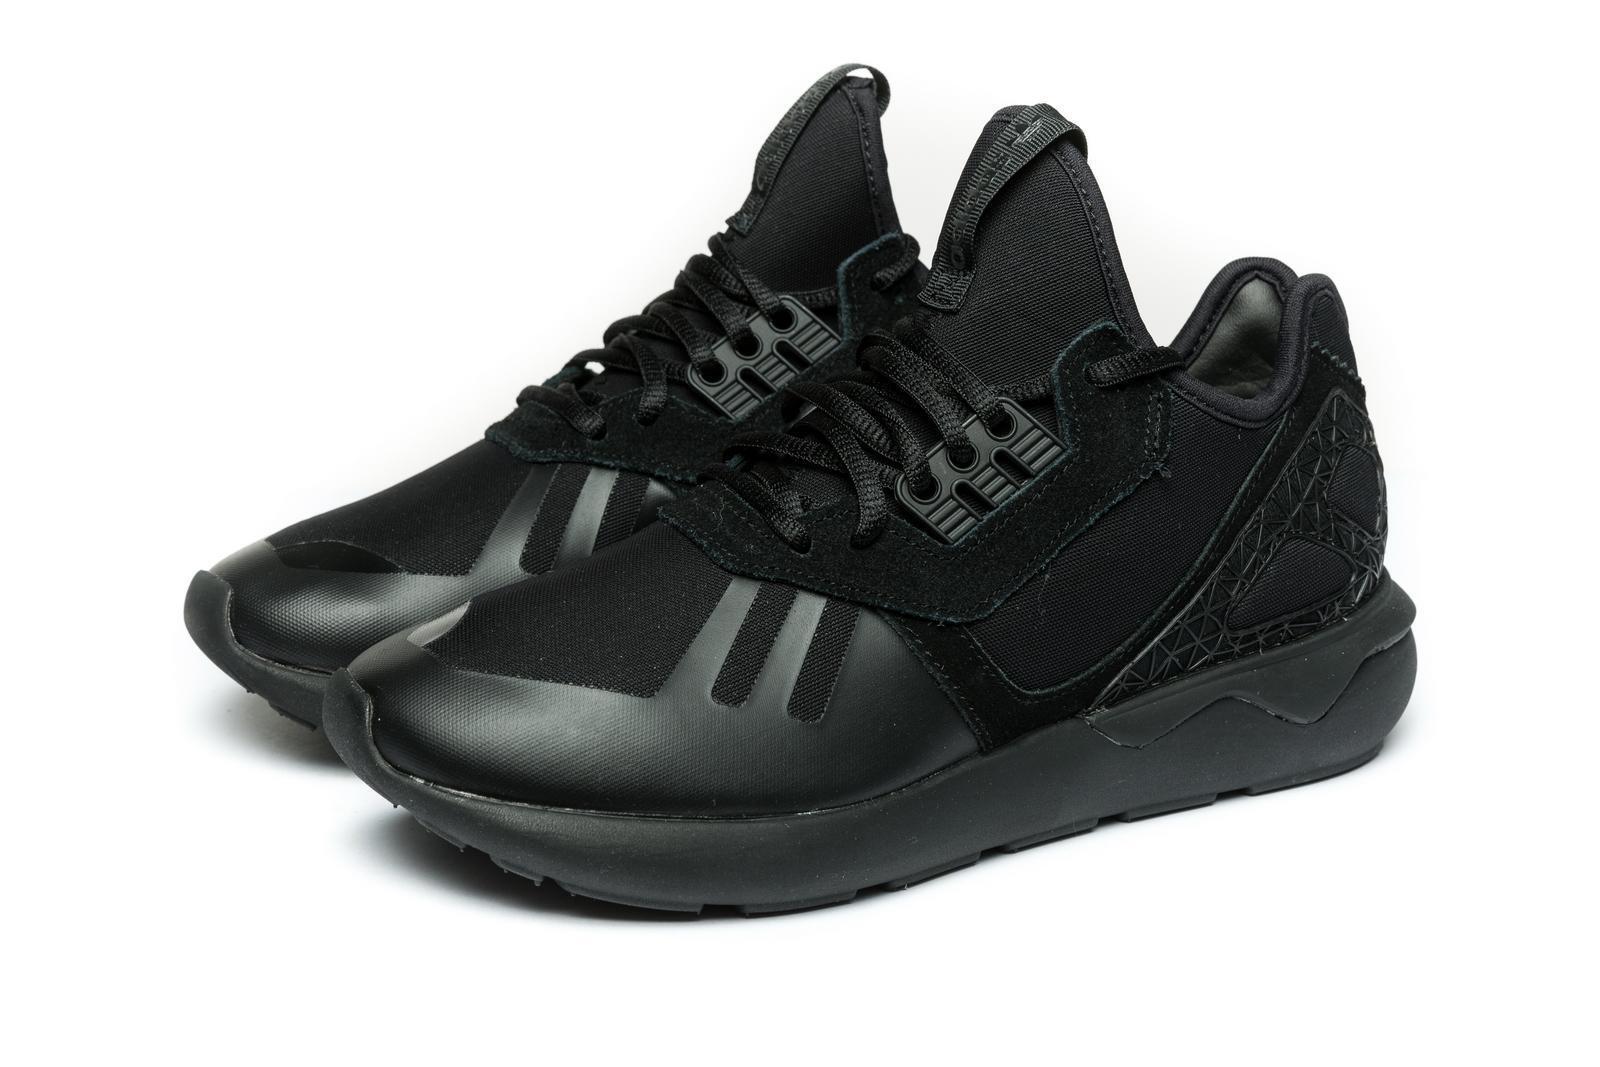 Adidas Originals Tubular Runner Mujer/Unisex Triple Entrenadores S81264-Negro Triple Mujer/Unisex ca5c0d